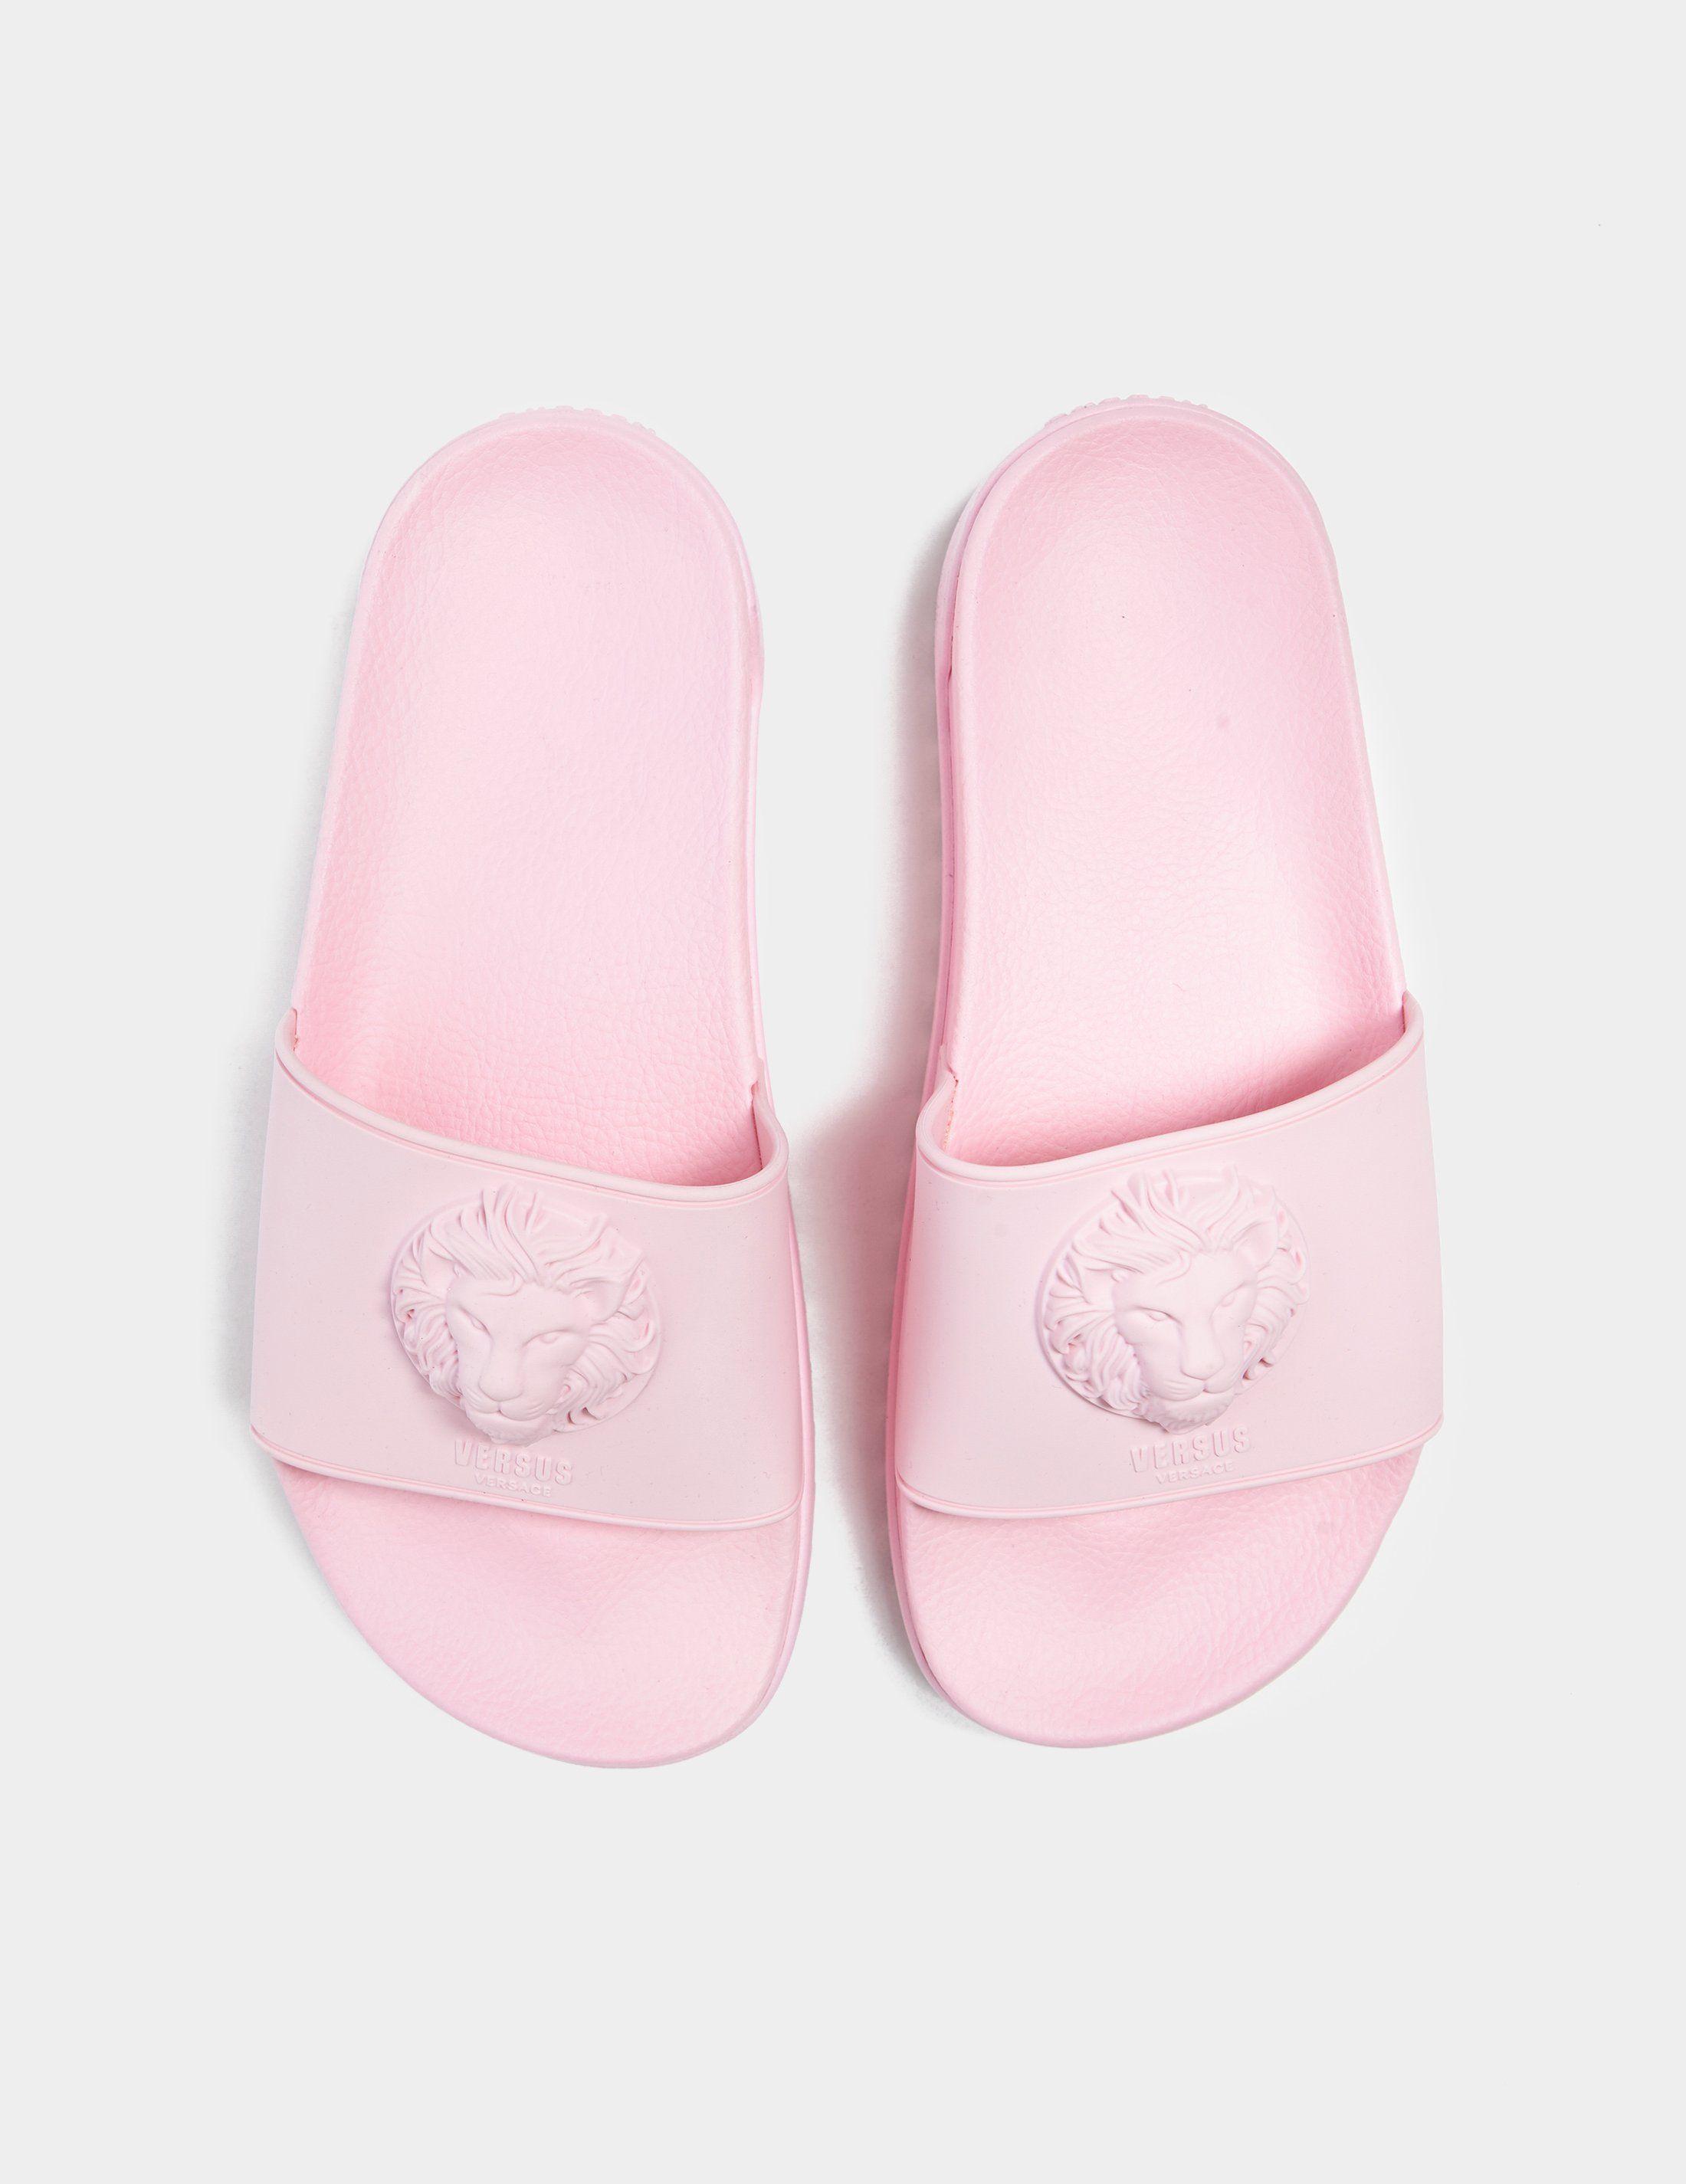 Versus Versace Lion Head Slides